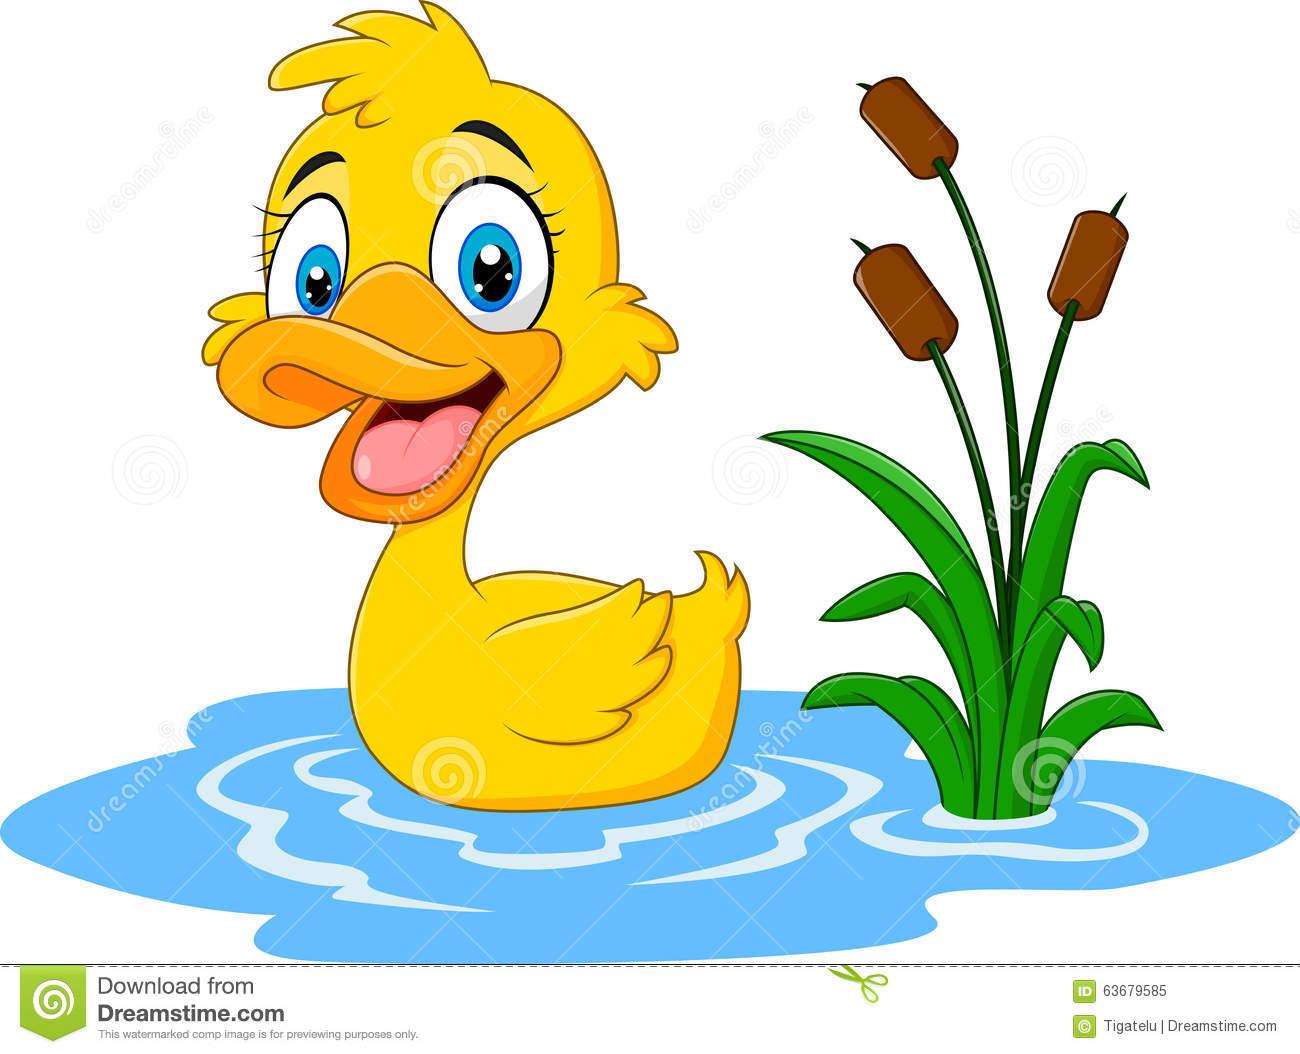 Duck in water clipart.